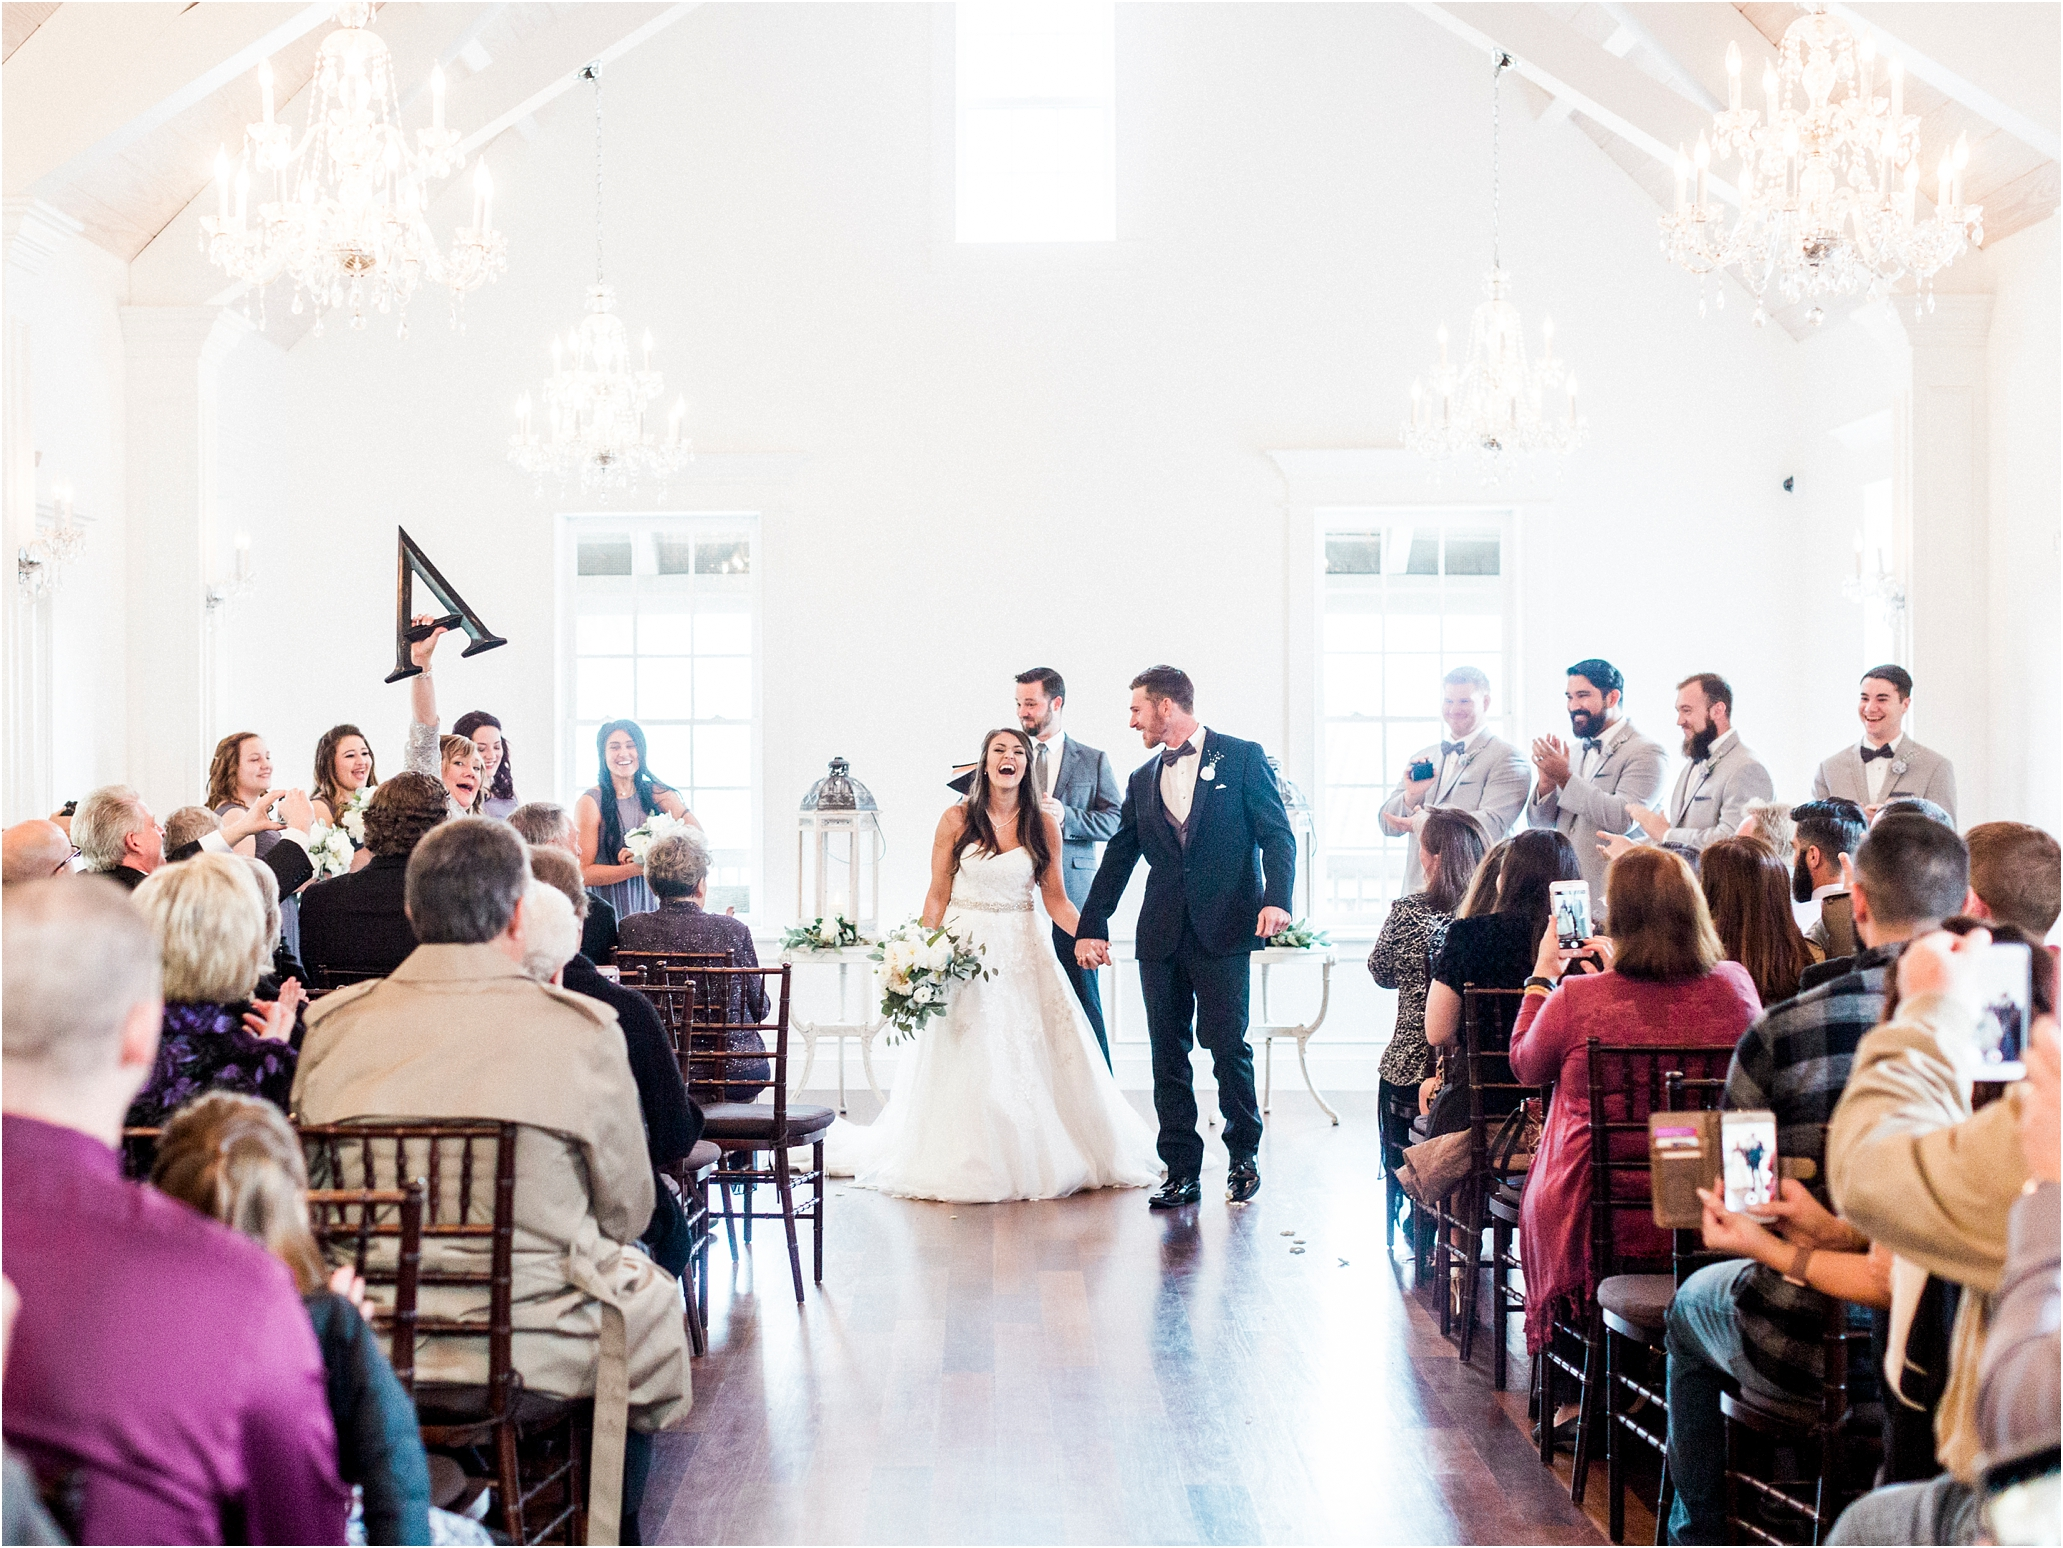 Lisa Silva Photography- Ponte Vedra Beach and Jacksonville, Florida Fine Art Film Wedding Photography- Wedding at The White Room Villa Blanca in St. Augustine, Florida_0051.jpg